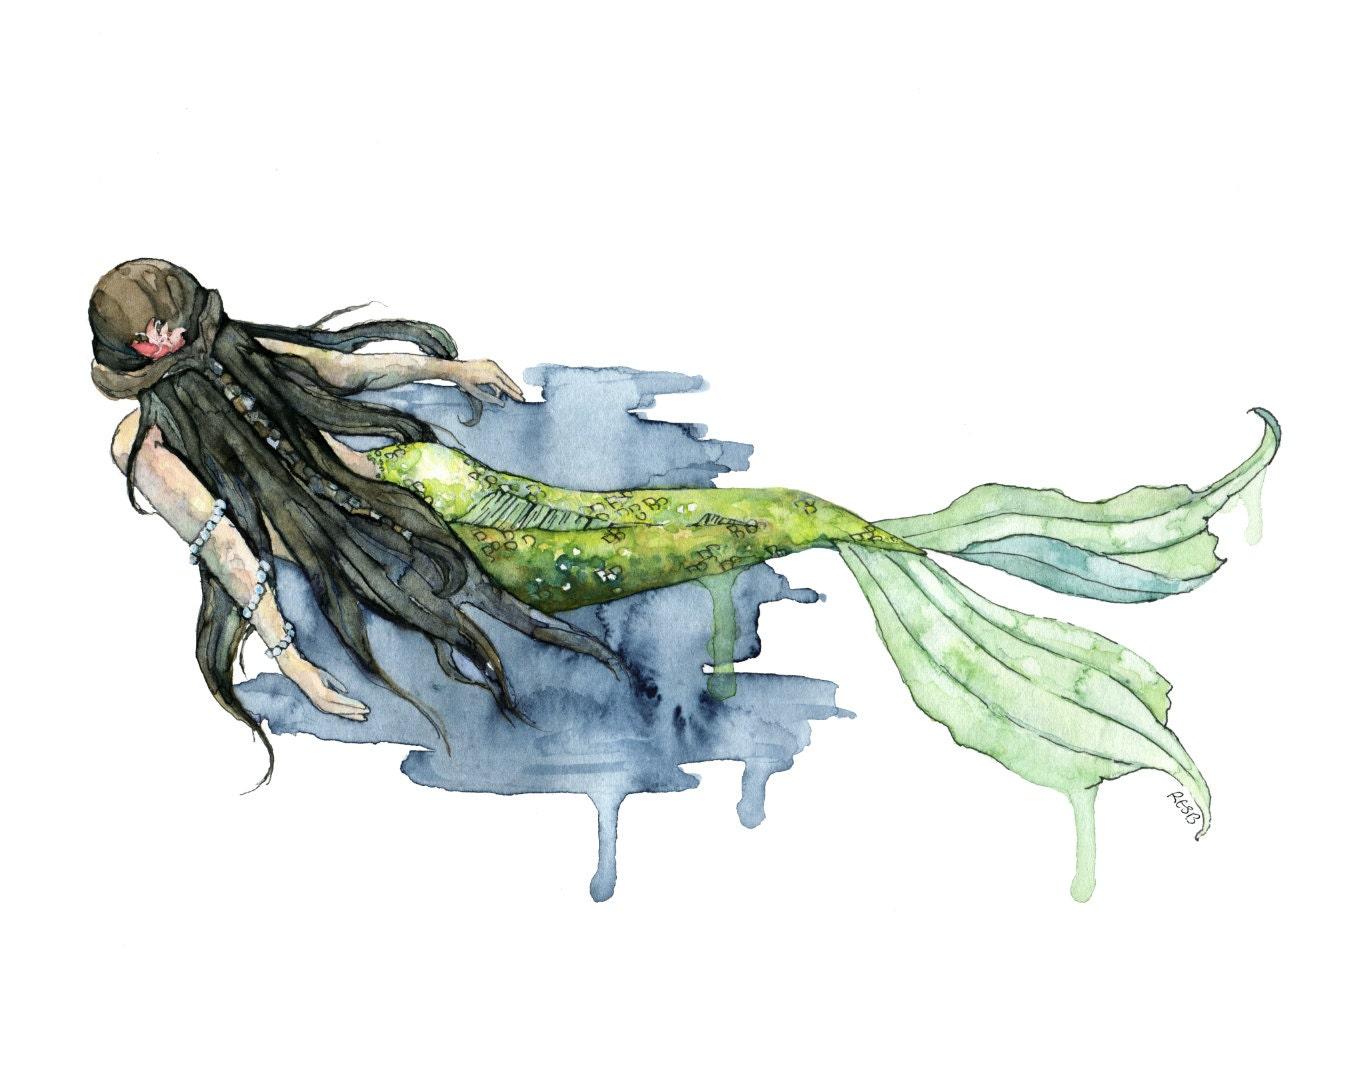 watercolor mermaid painting print titled